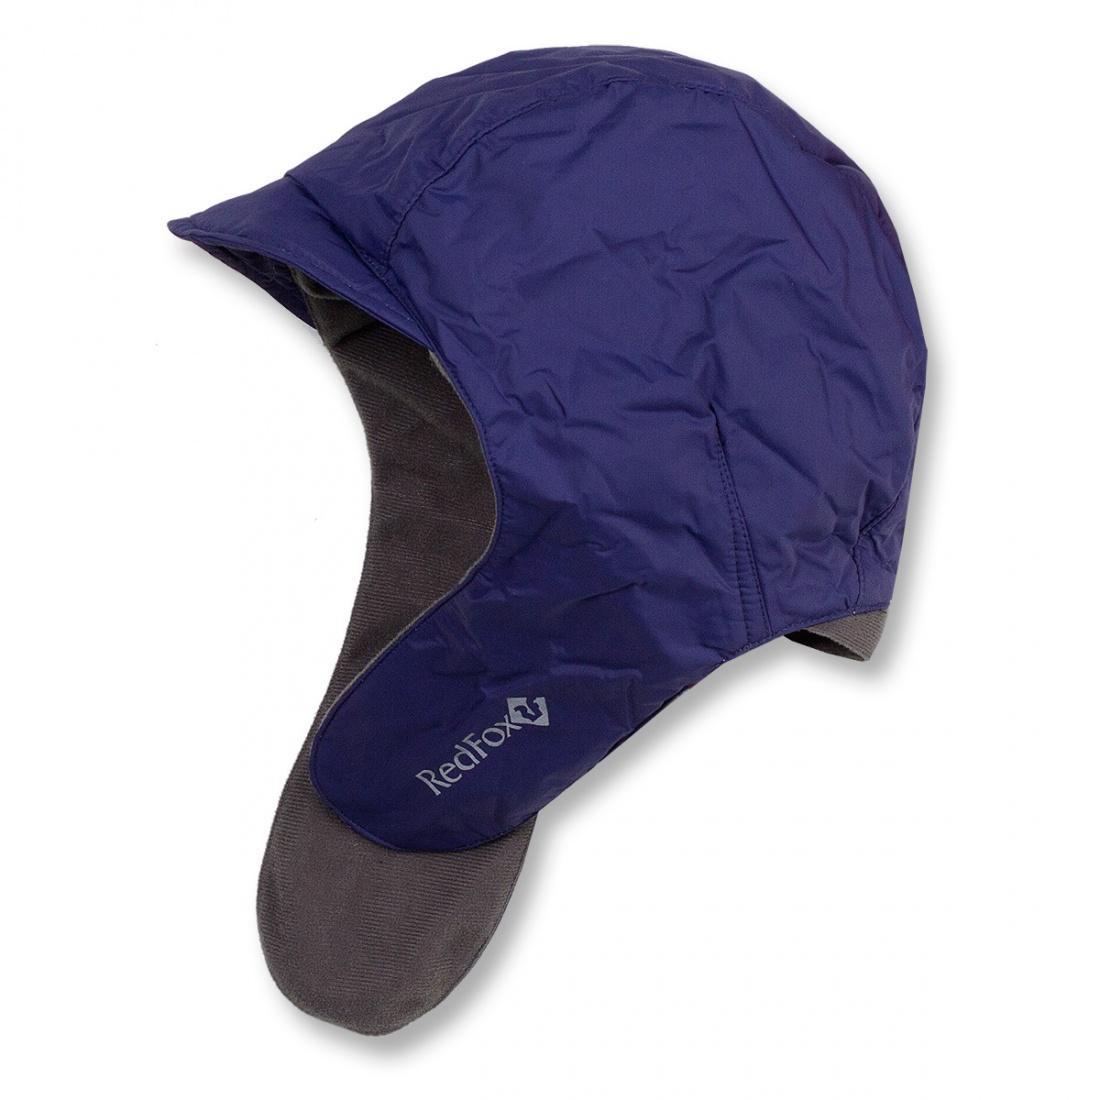 Шапка детска PilotУшанки<br><br> Удобна стильна шапочка дл детей от года. <br><br> <br><br><br><br> Материал – Dry Factor 1000.<br><br> <br><br><br> Утеплитель – Omniterm Classic.<br><br> <br><br><br> Облегащий крой.<br><br> <br><br>...<br><br>Цвет: Темно-синий<br>Размер: XXL